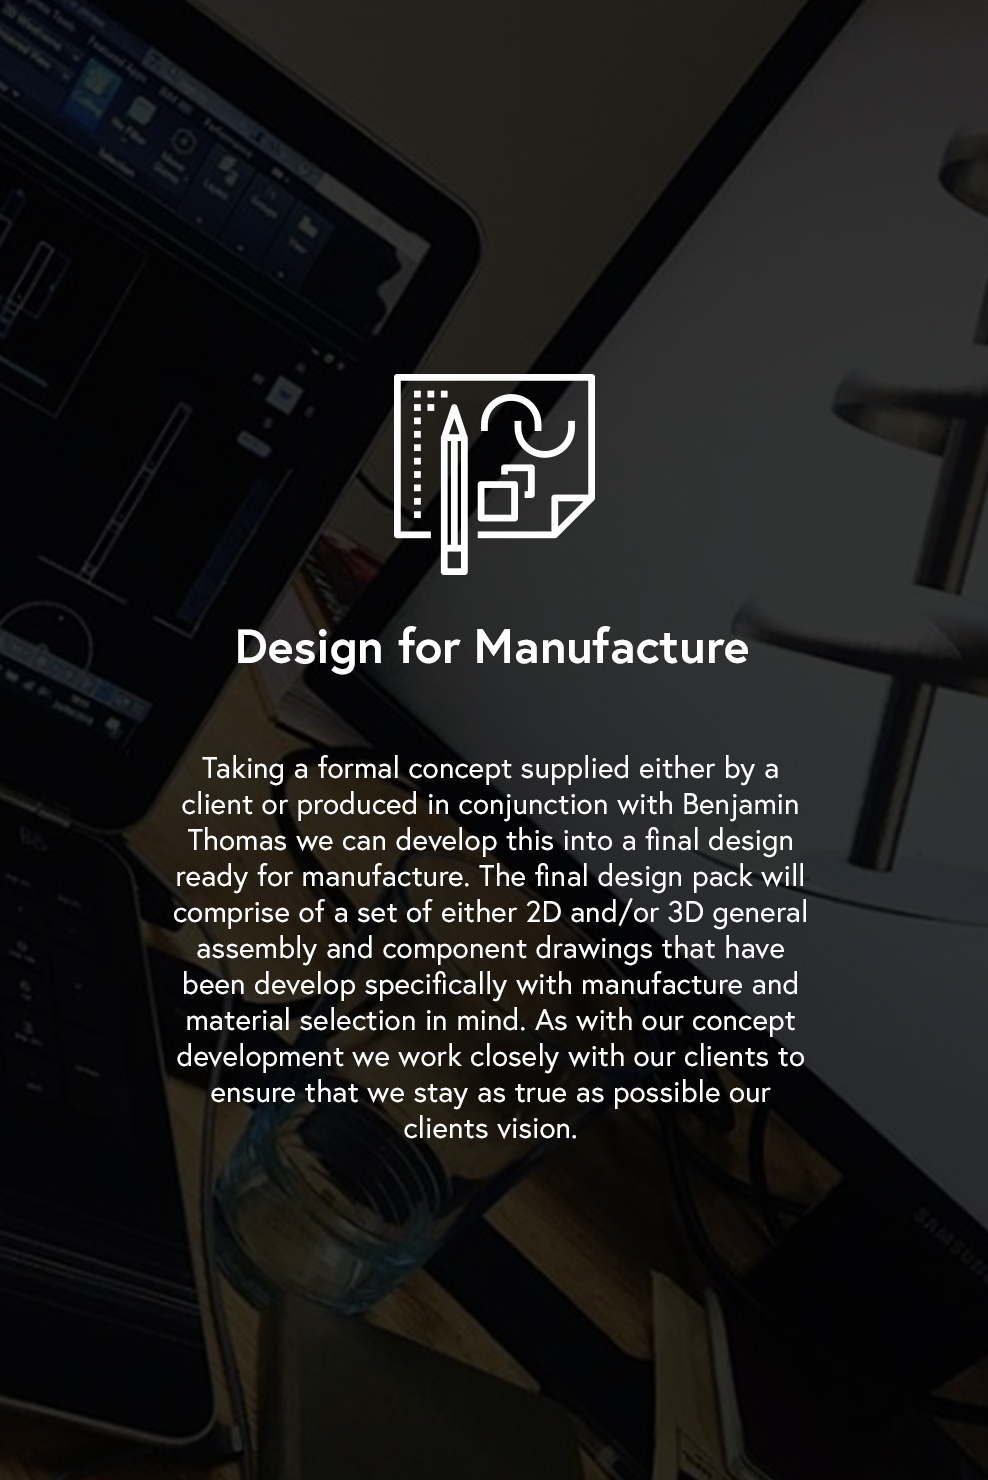 design-for-manufacture-2.jpg